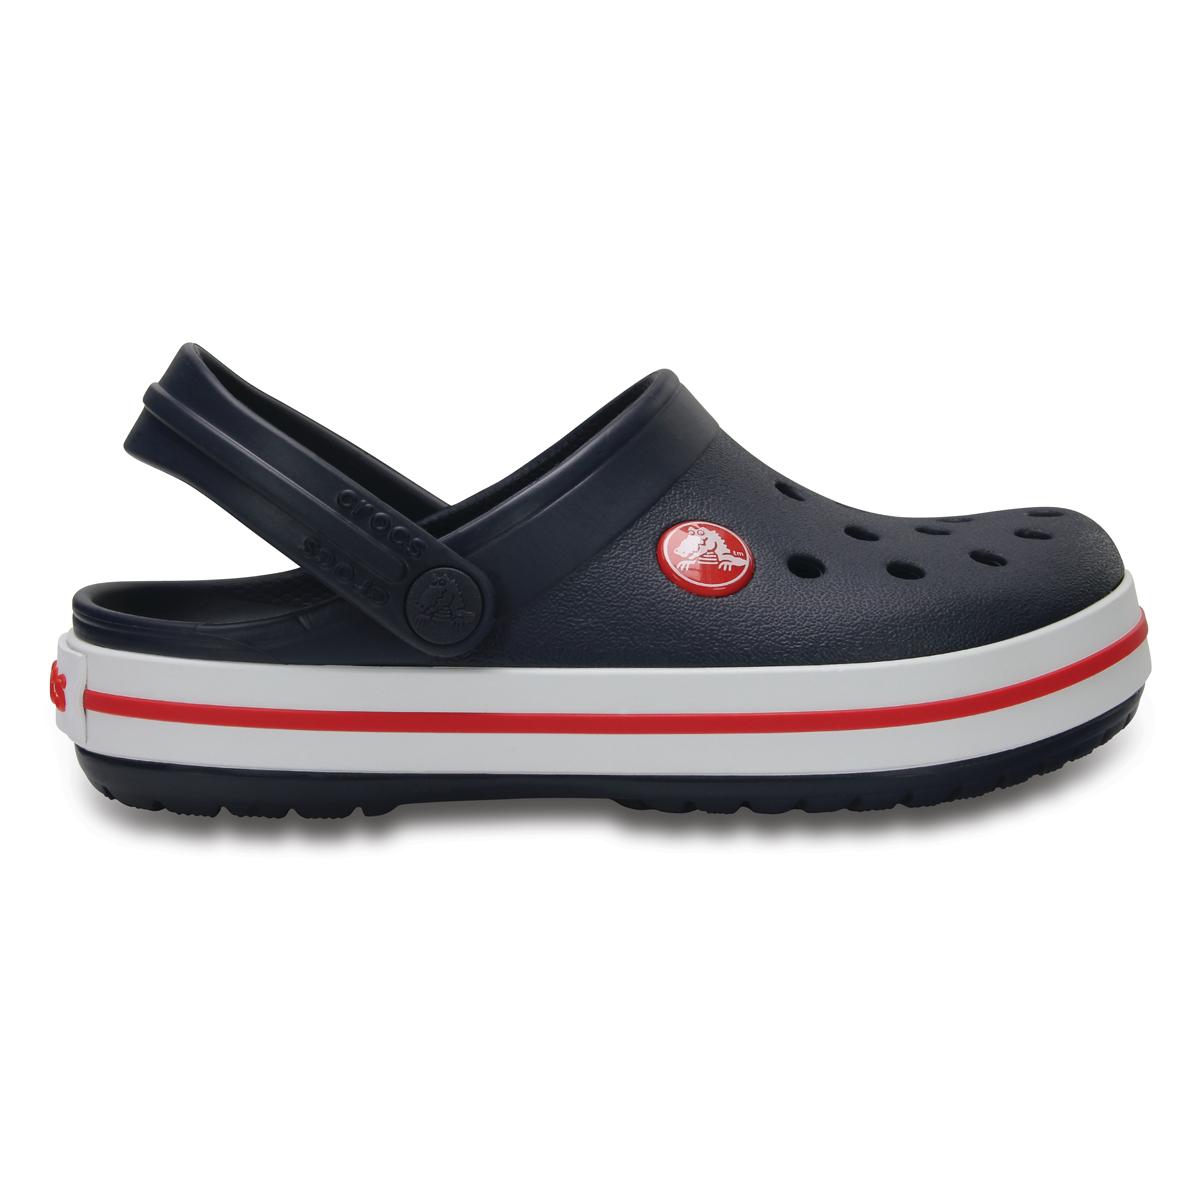 Crocs Crocband Clog K - Lacivert/Kırmızı